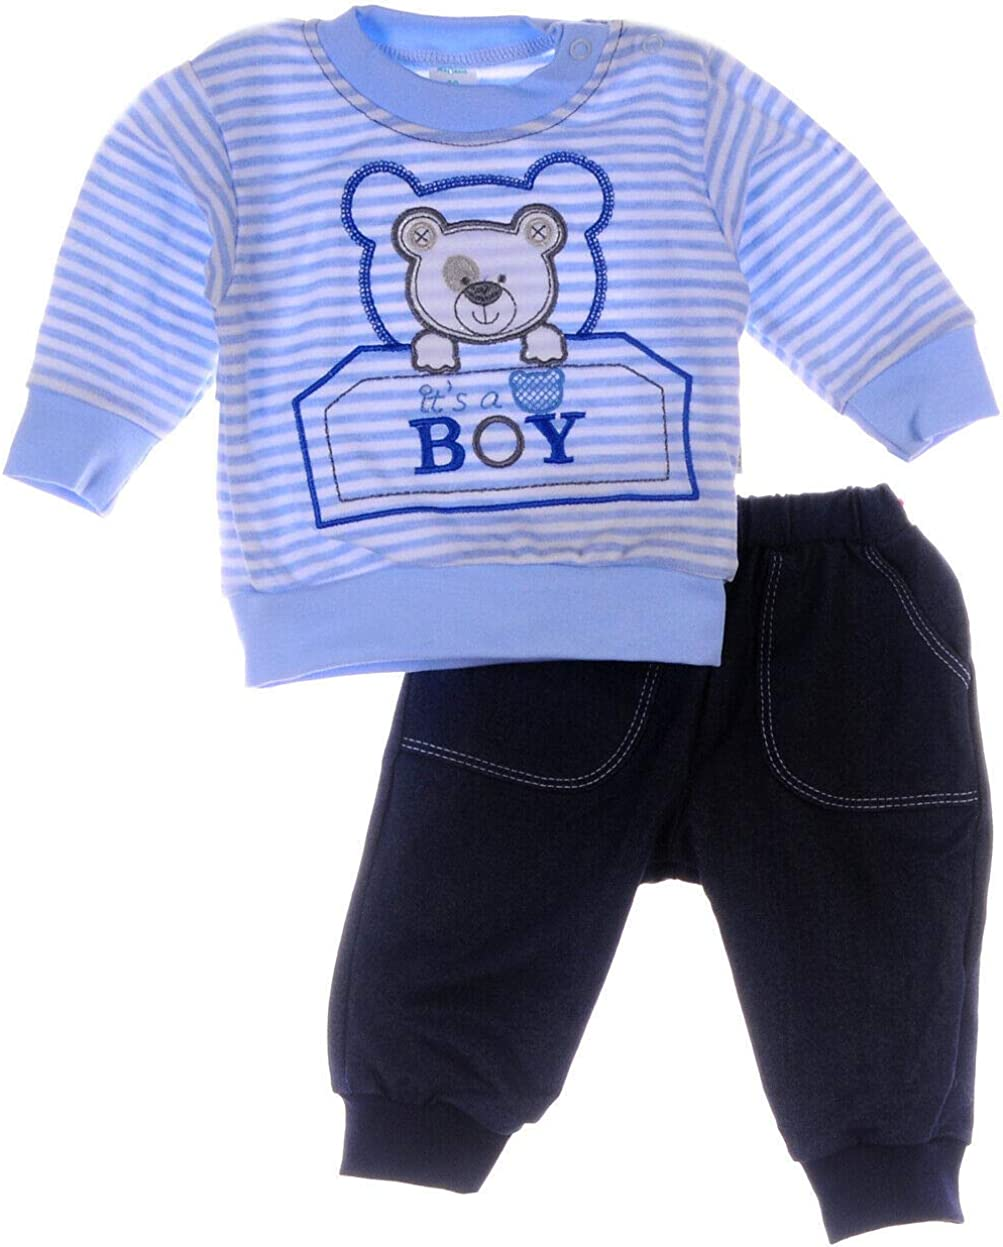 Anzug Pullover Hose Baby Set 62 68 74 80 86 Shirt Jogginganzug Kombi Zweiteiler